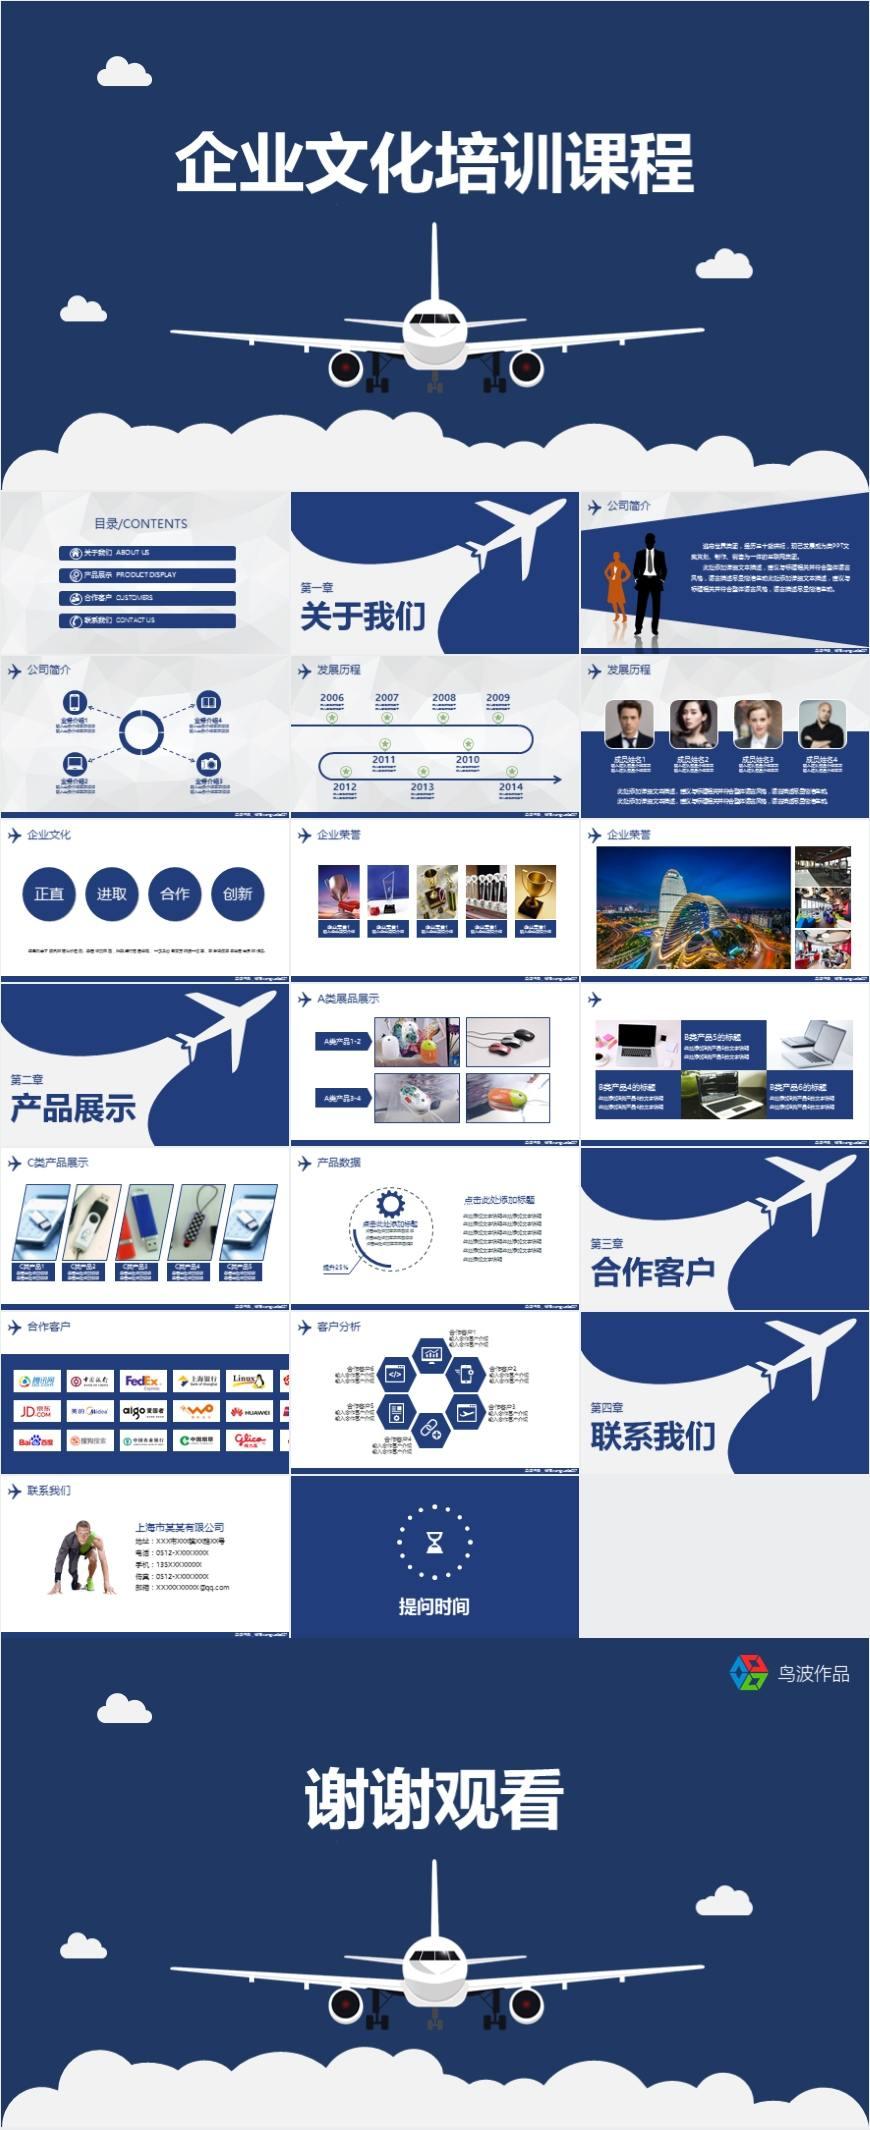 CL0095 企业文化培训课程PPT